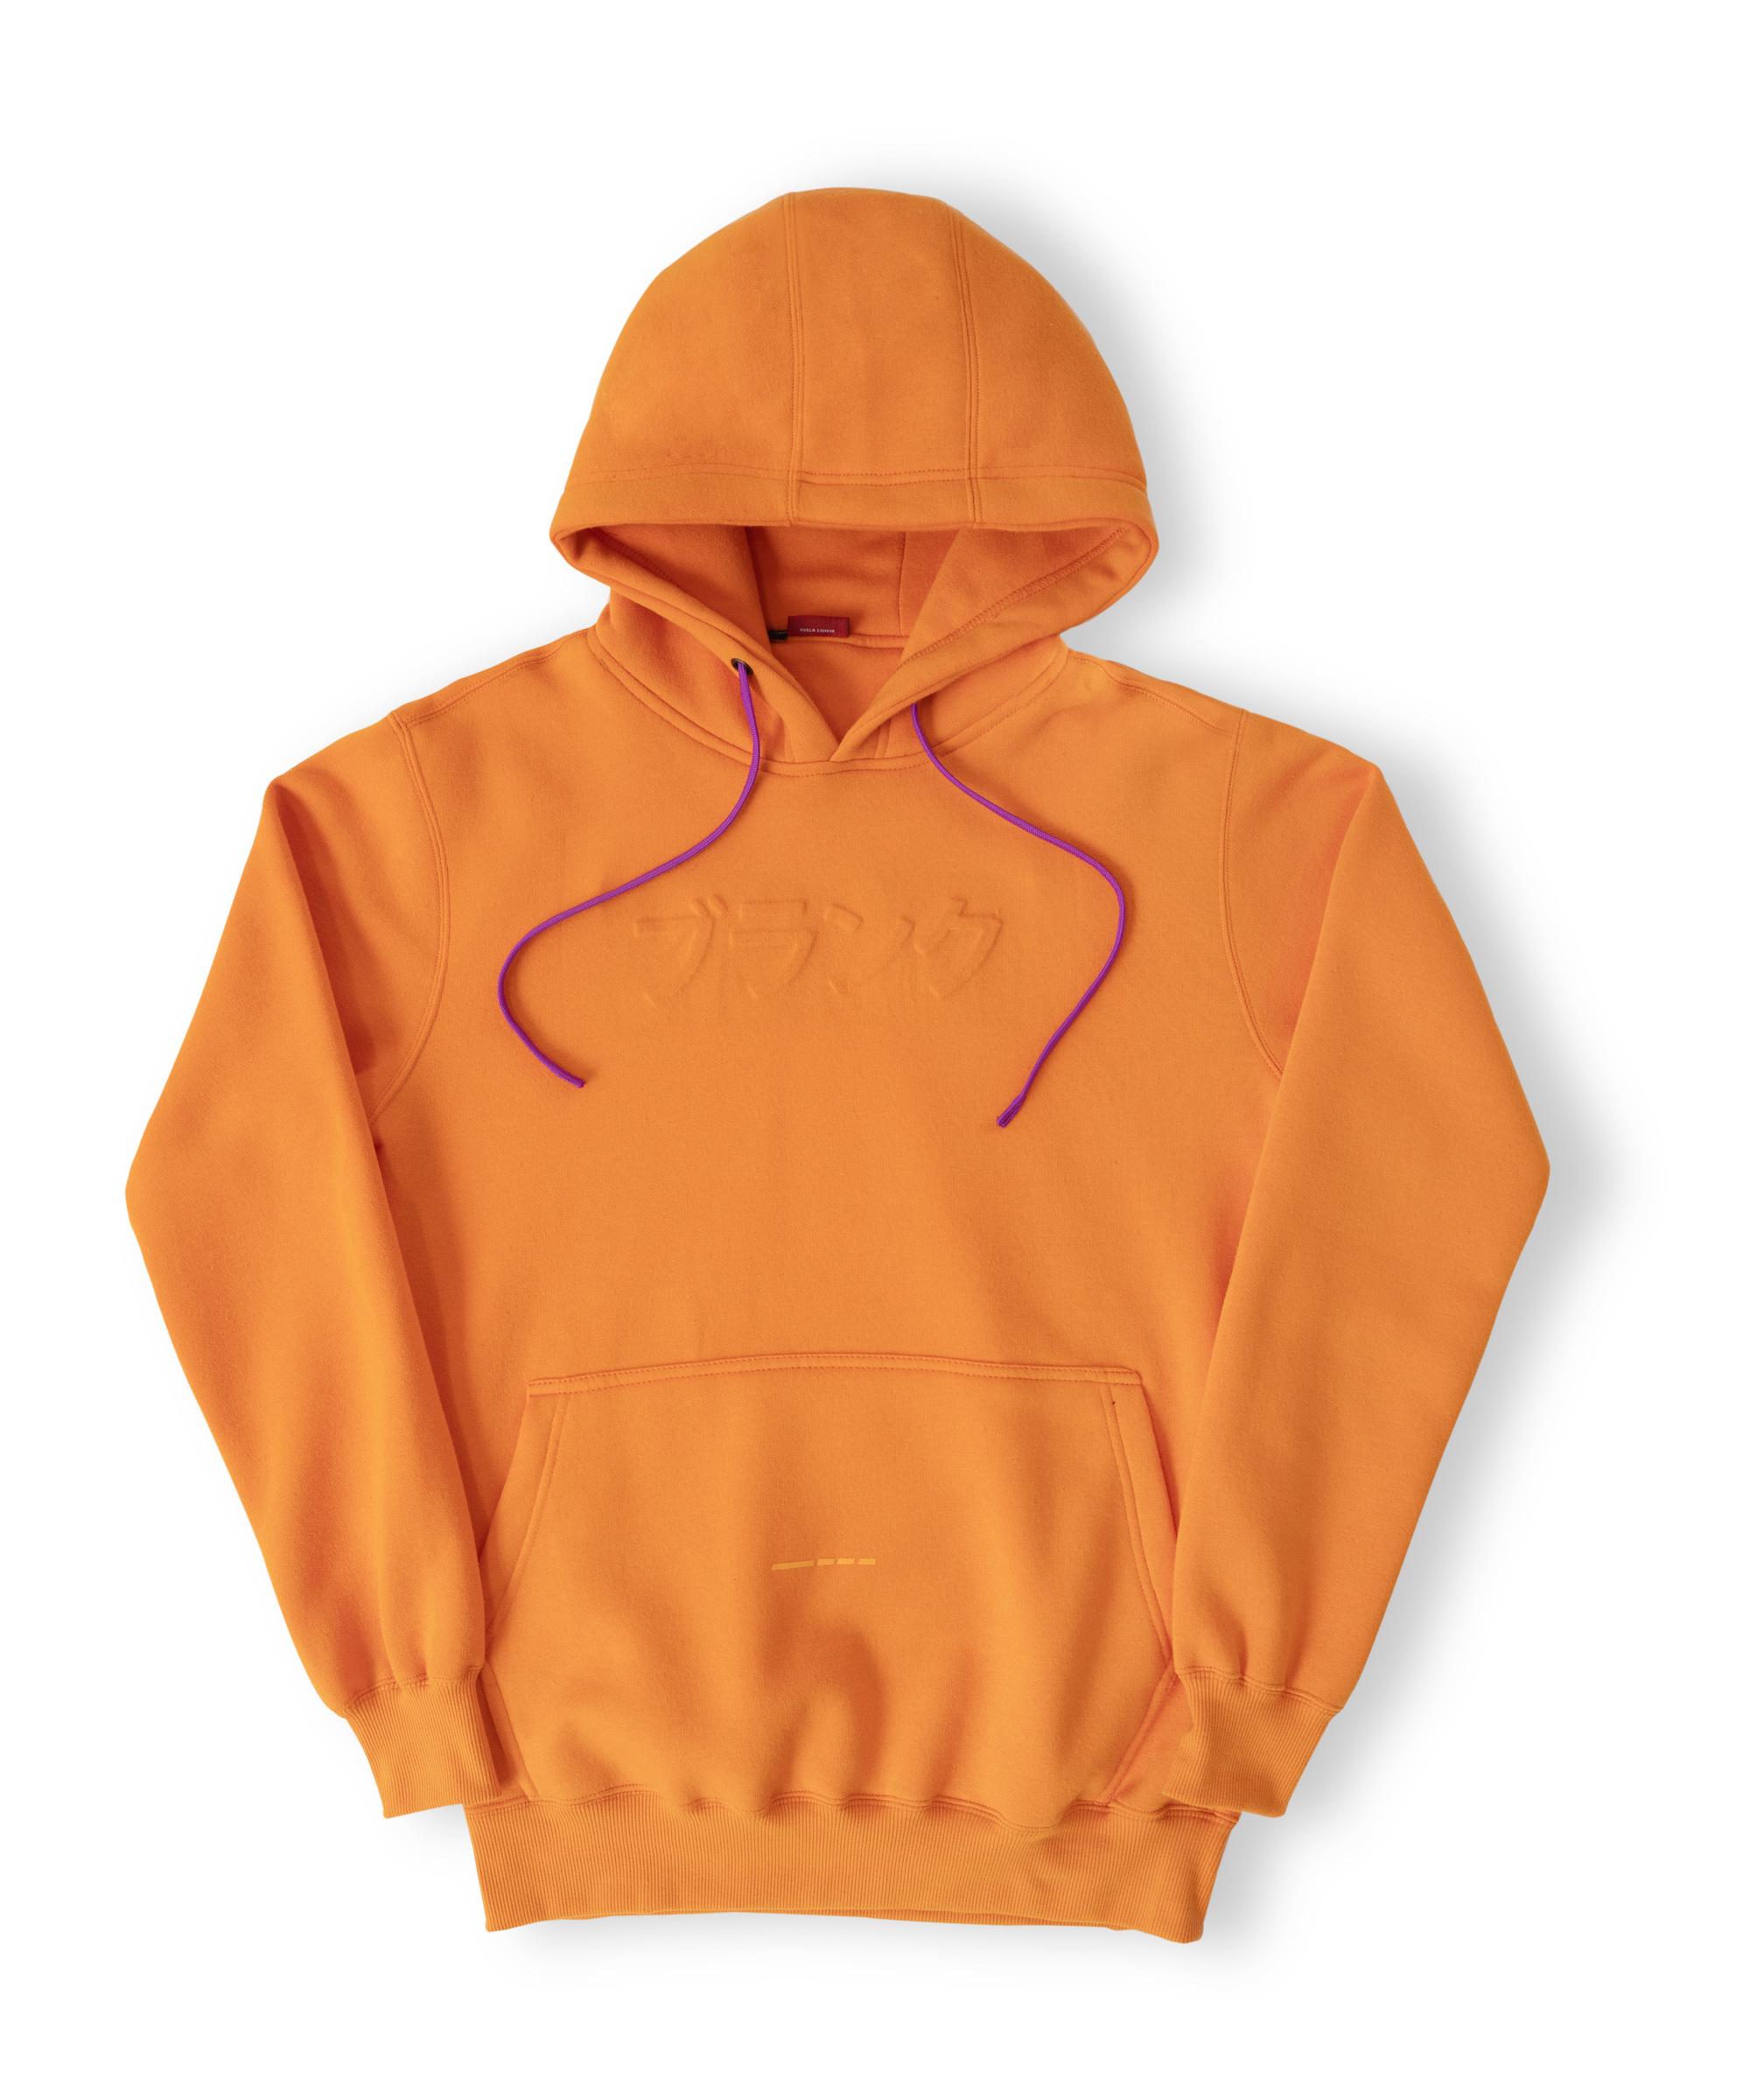 Pullover (Orange).jpg